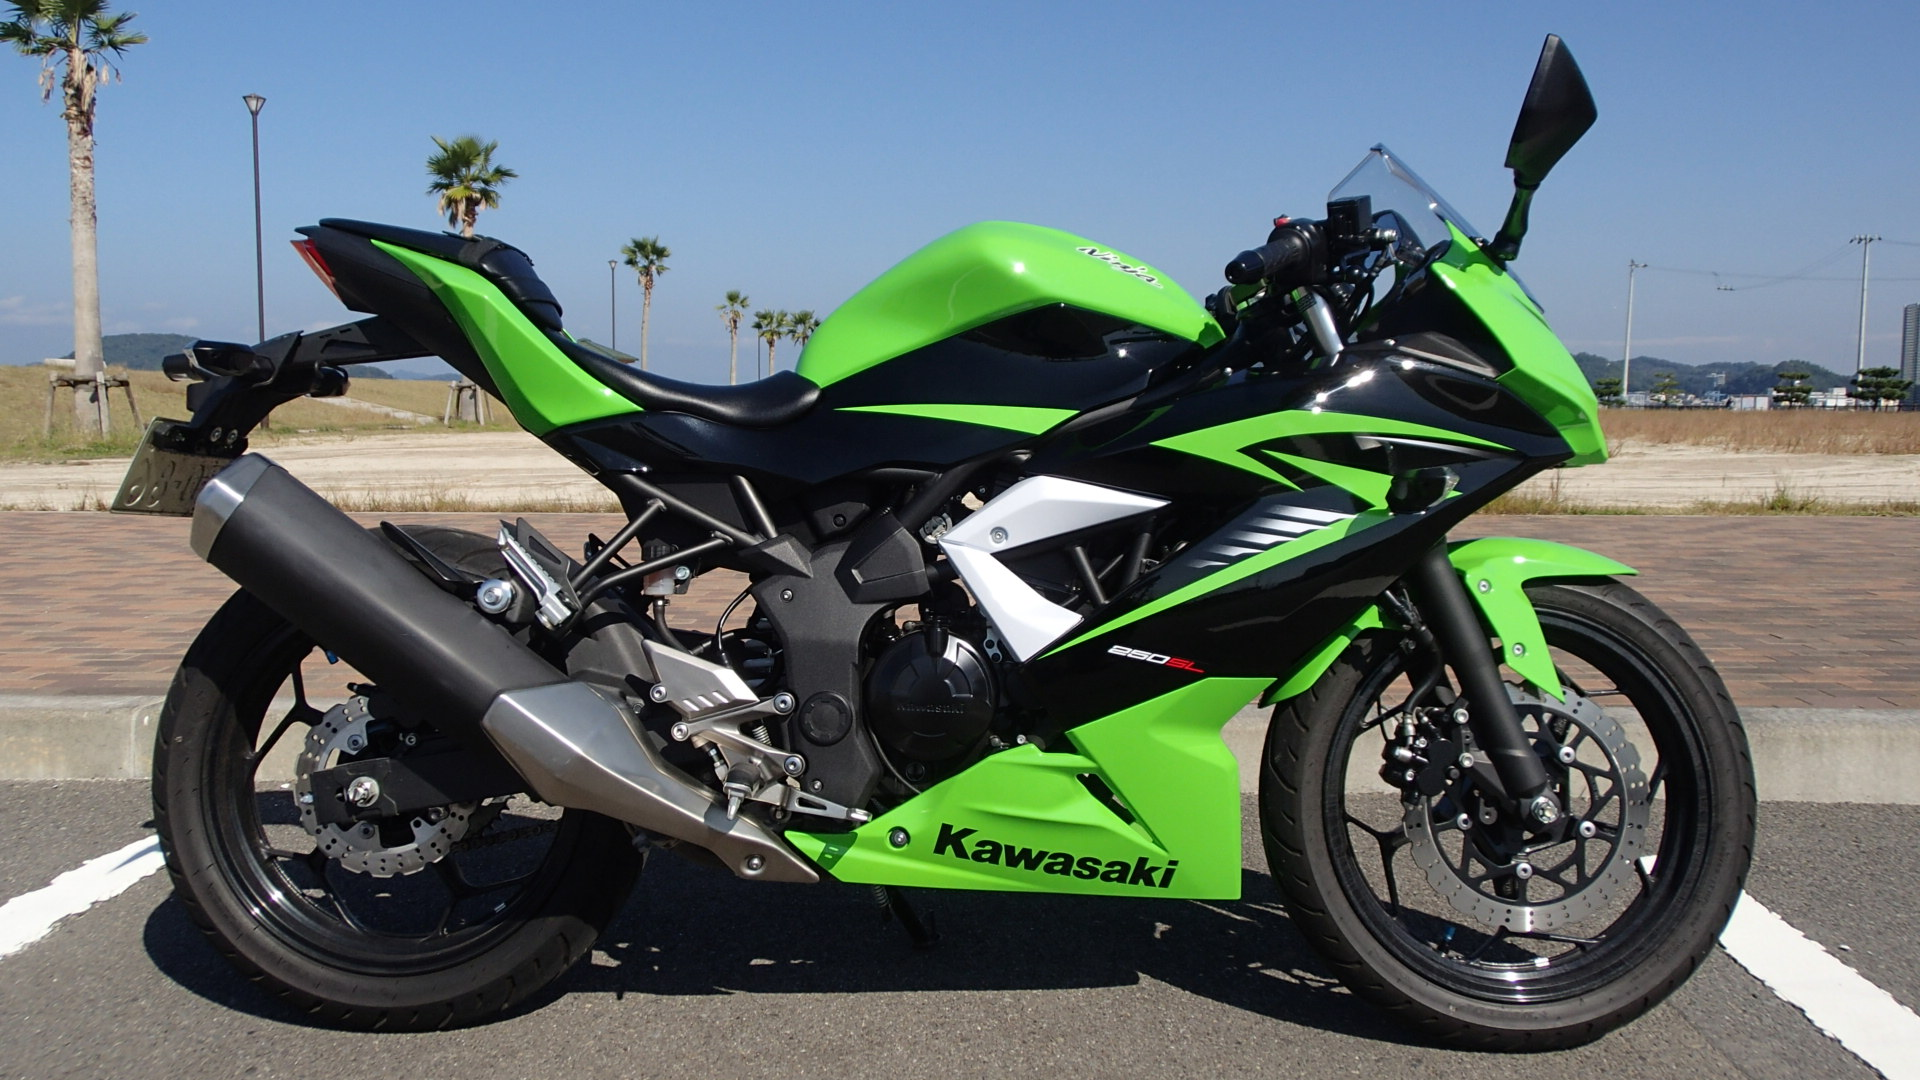 Kawasaki Ninja 250SL 2019 Akan Diluncurkan Awal Maret Ini